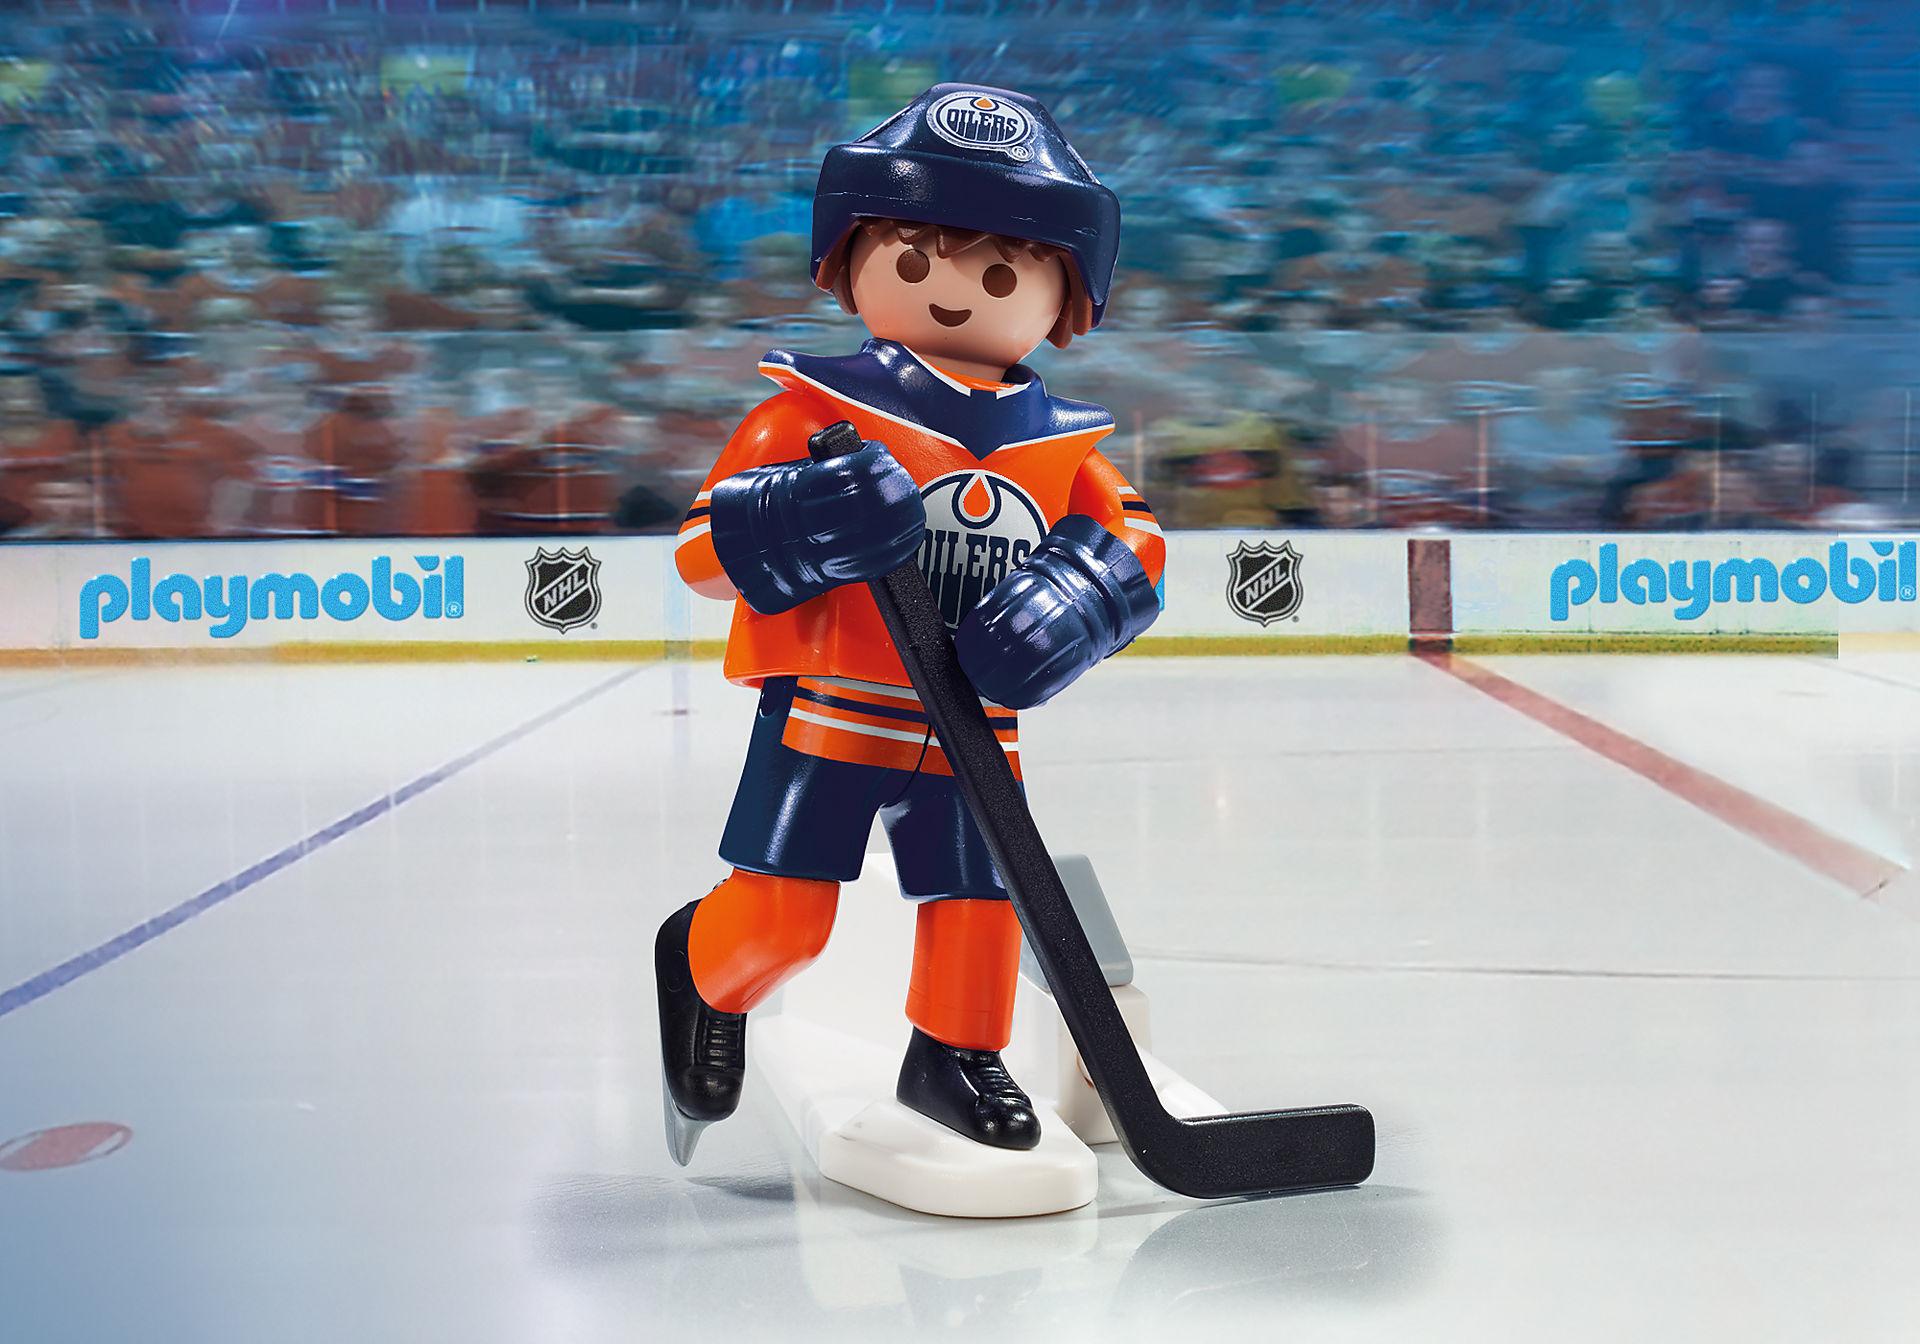 9023 NHL Jugador Edmonton Oilers zoom image1